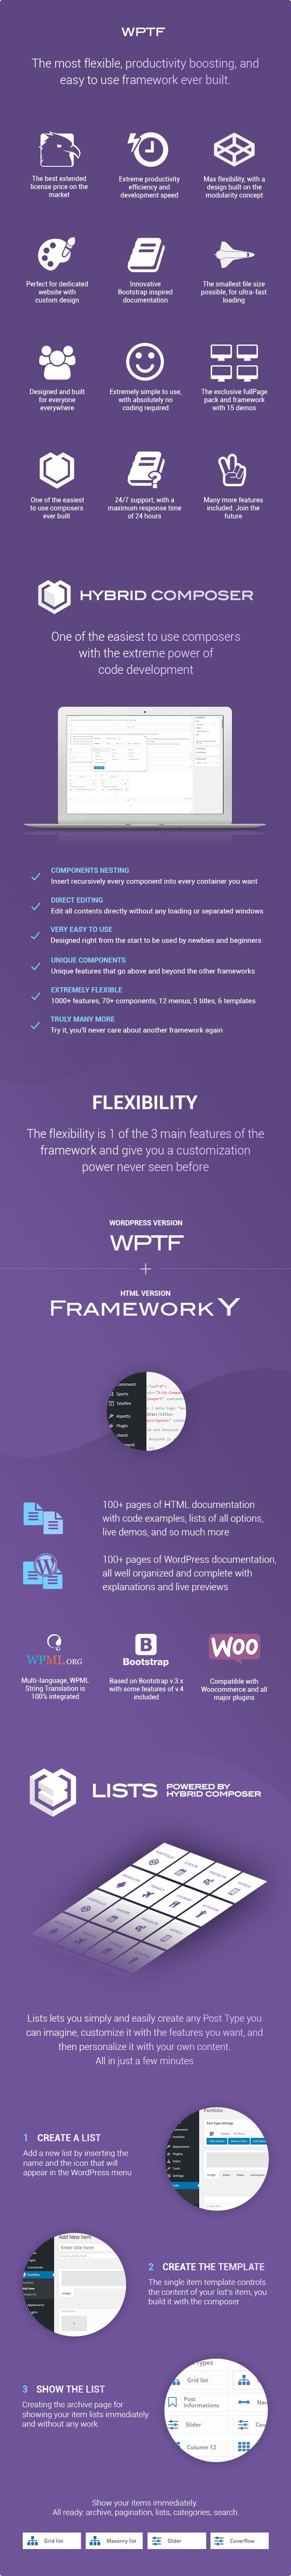 WPTF - WordPress Theme Framework - 4